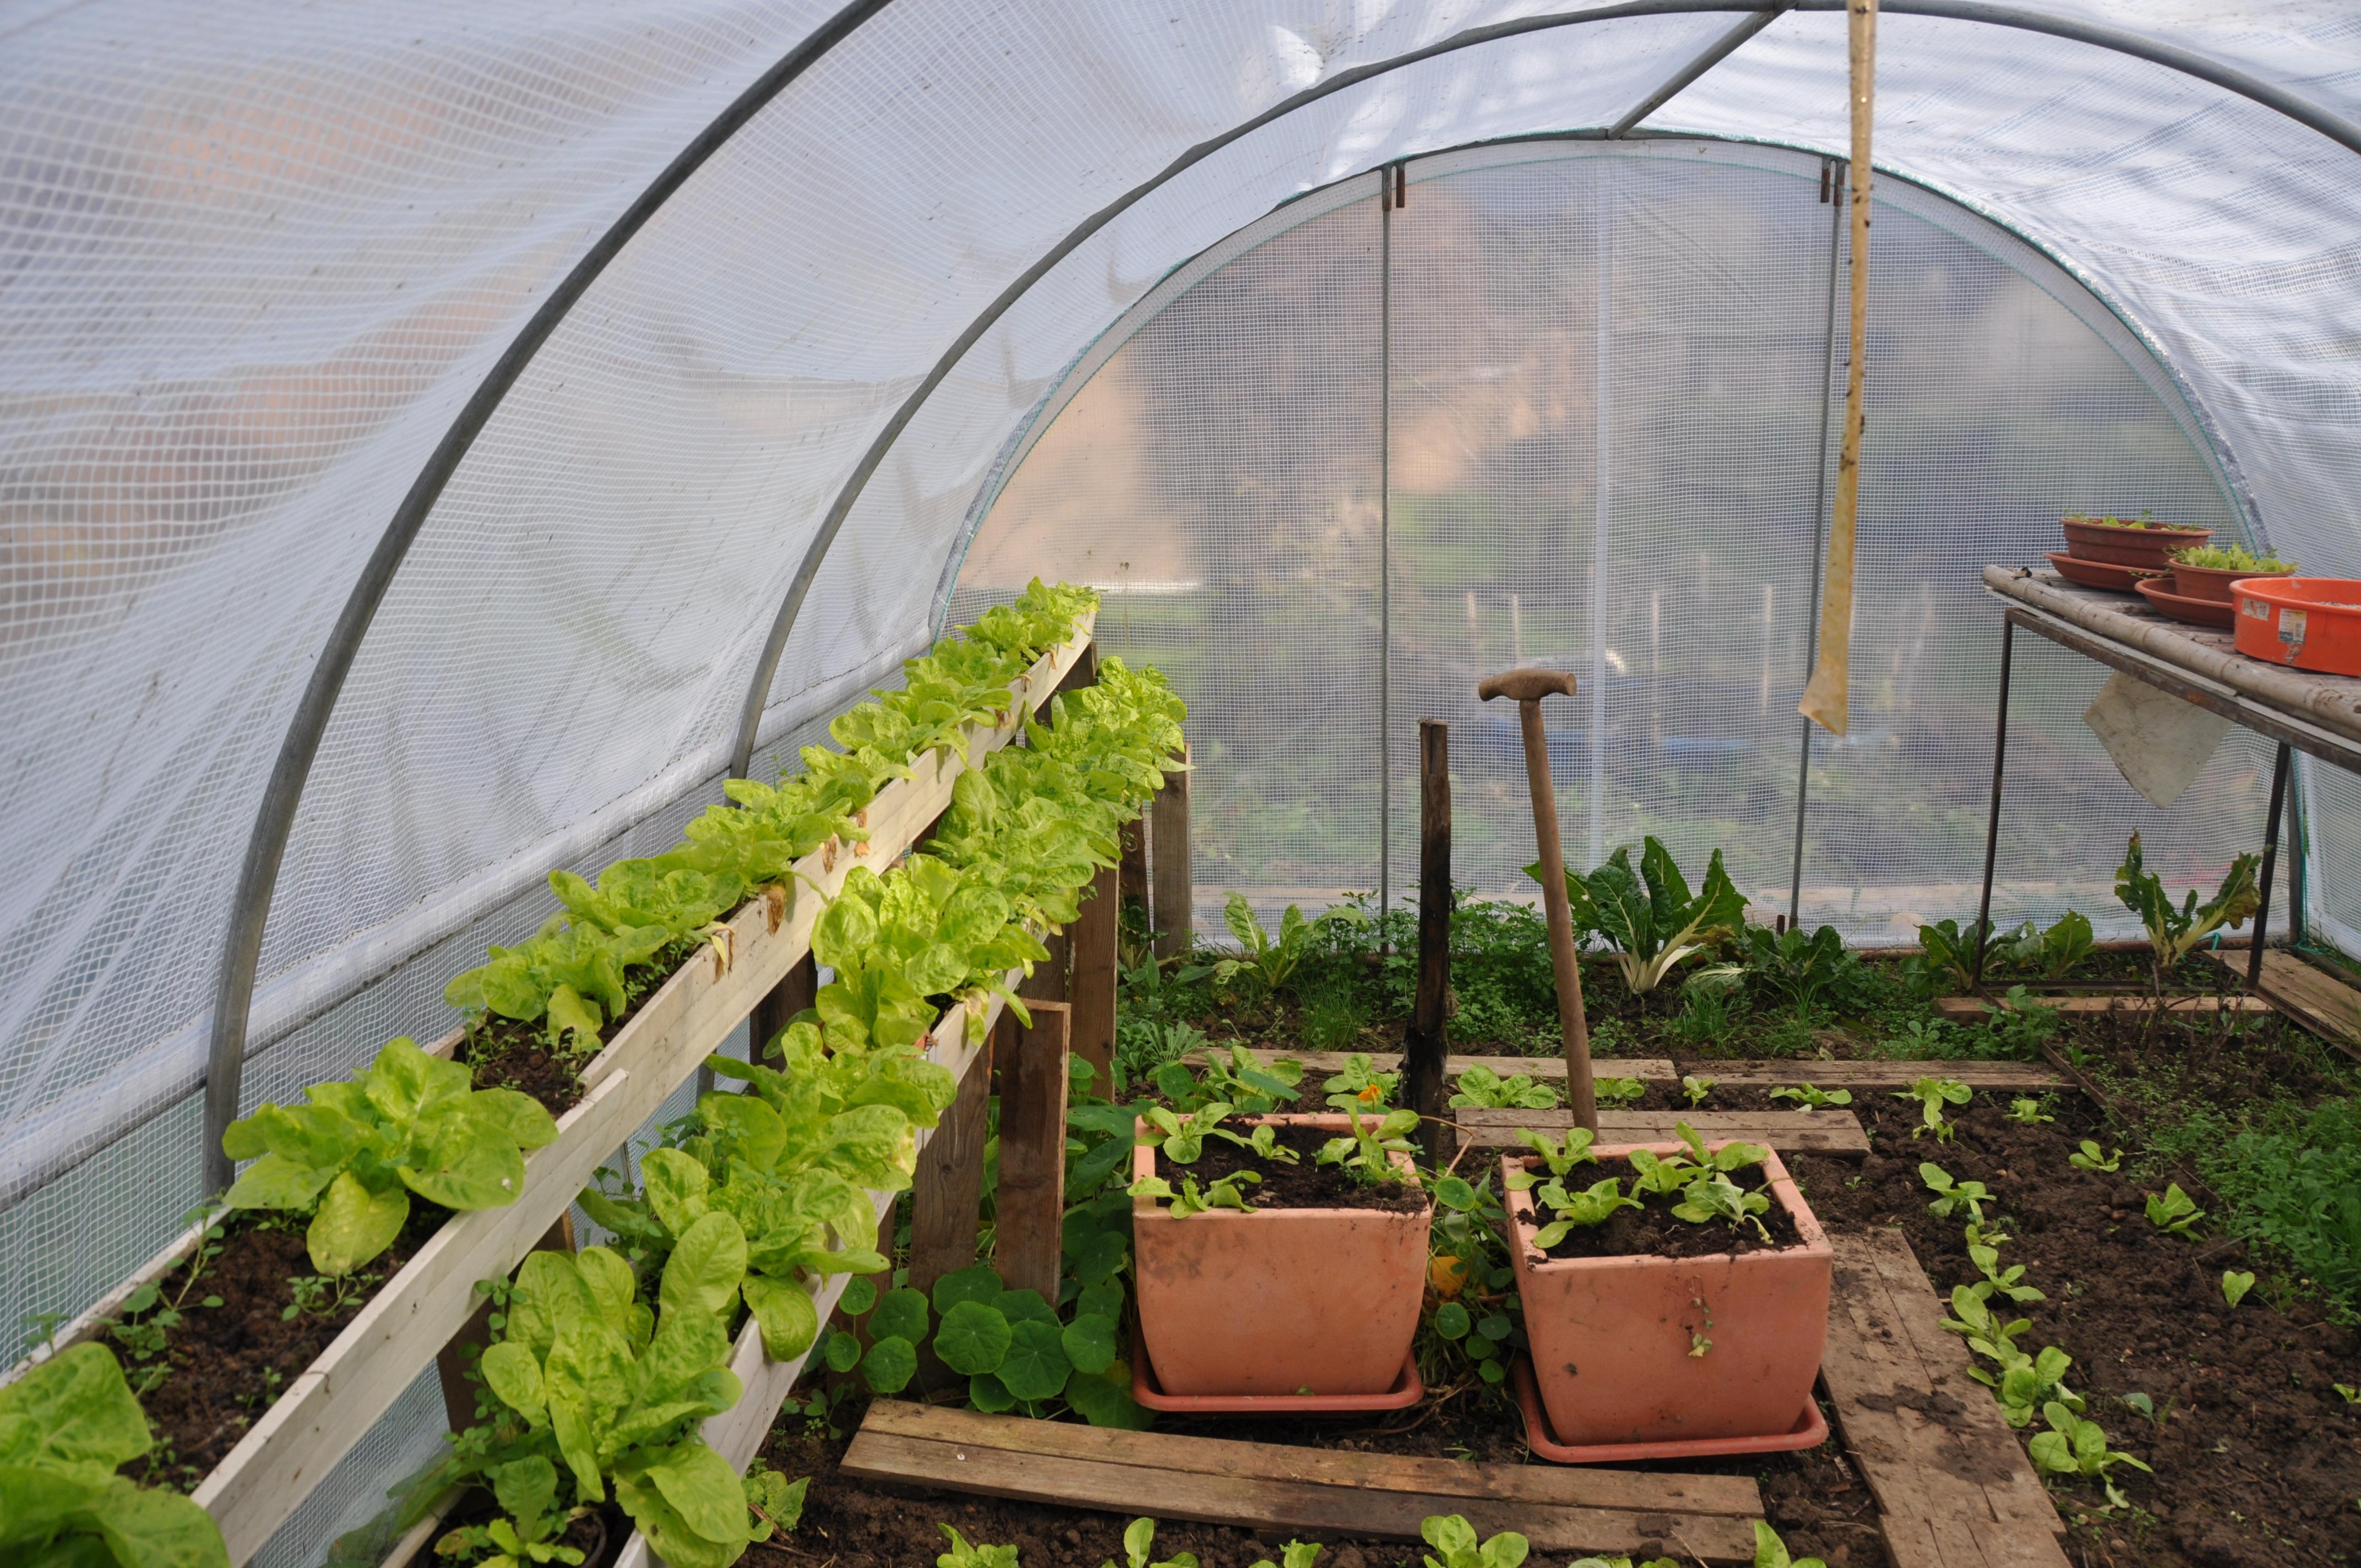 le jardin dans le sceptre d 39 ottokar jardiner avec jean paul. Black Bedroom Furniture Sets. Home Design Ideas